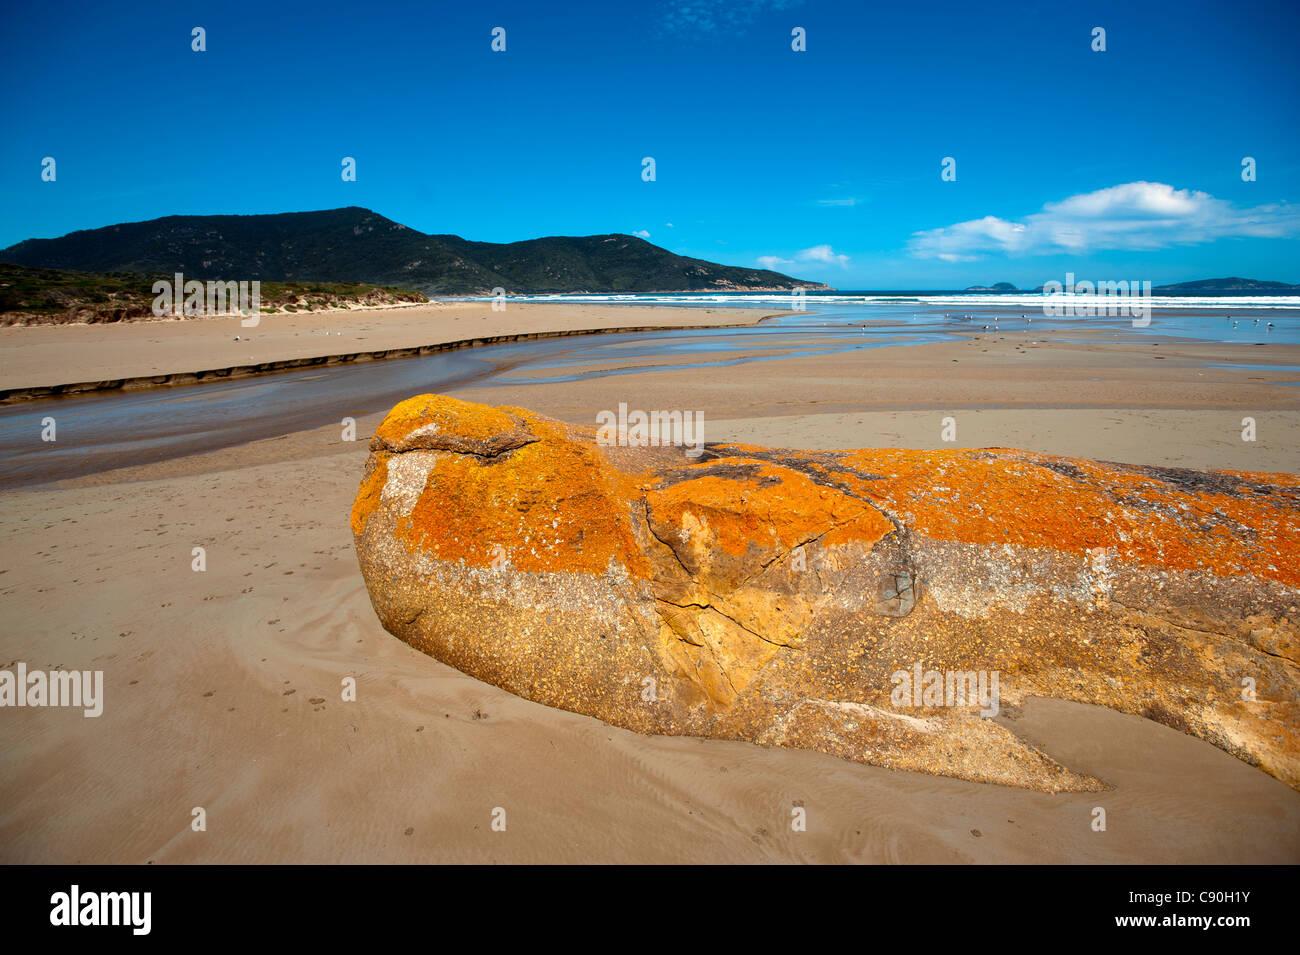 Oberon Bay, Wilsons Promontory National Park, Victoria, Australia Immagini Stock